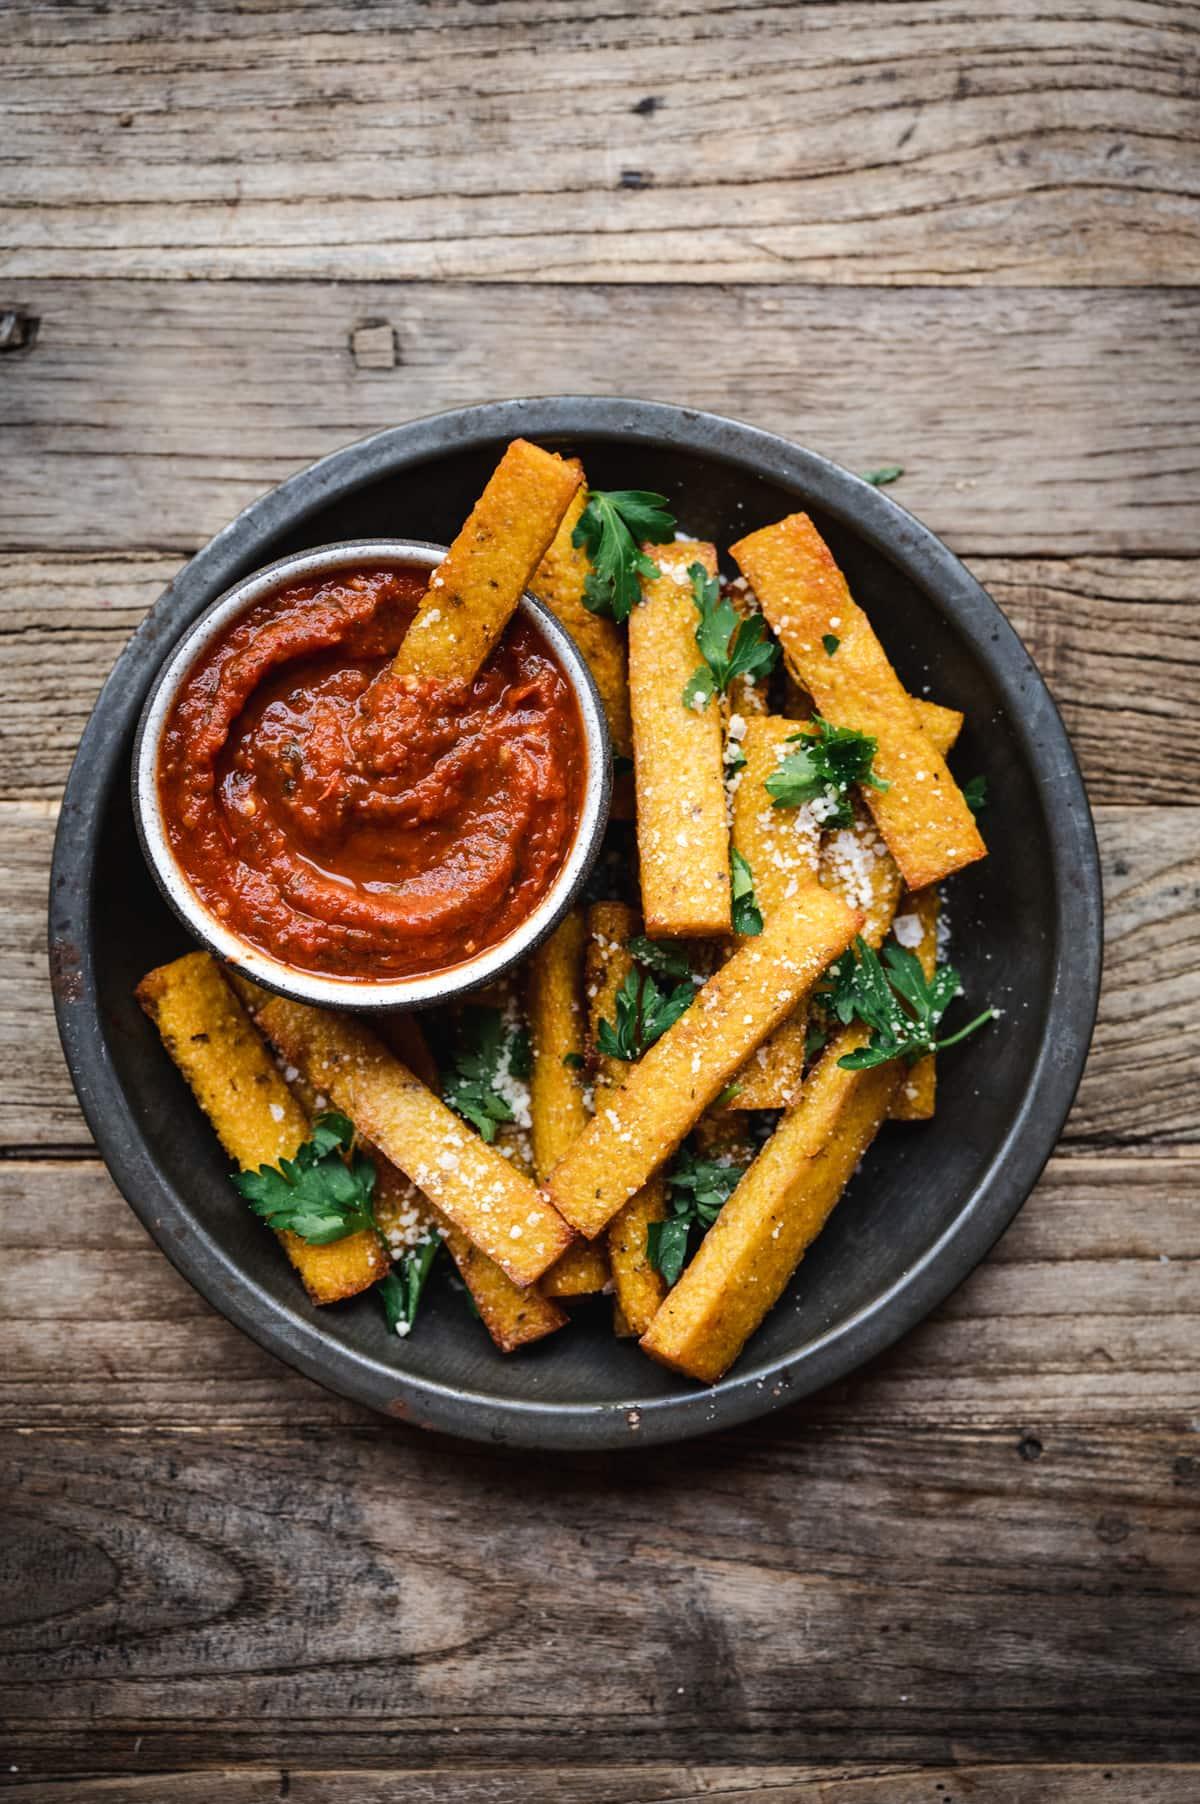 Polenta Fries With Marinara Dipping Sauce Vegan Crowded Kitchen